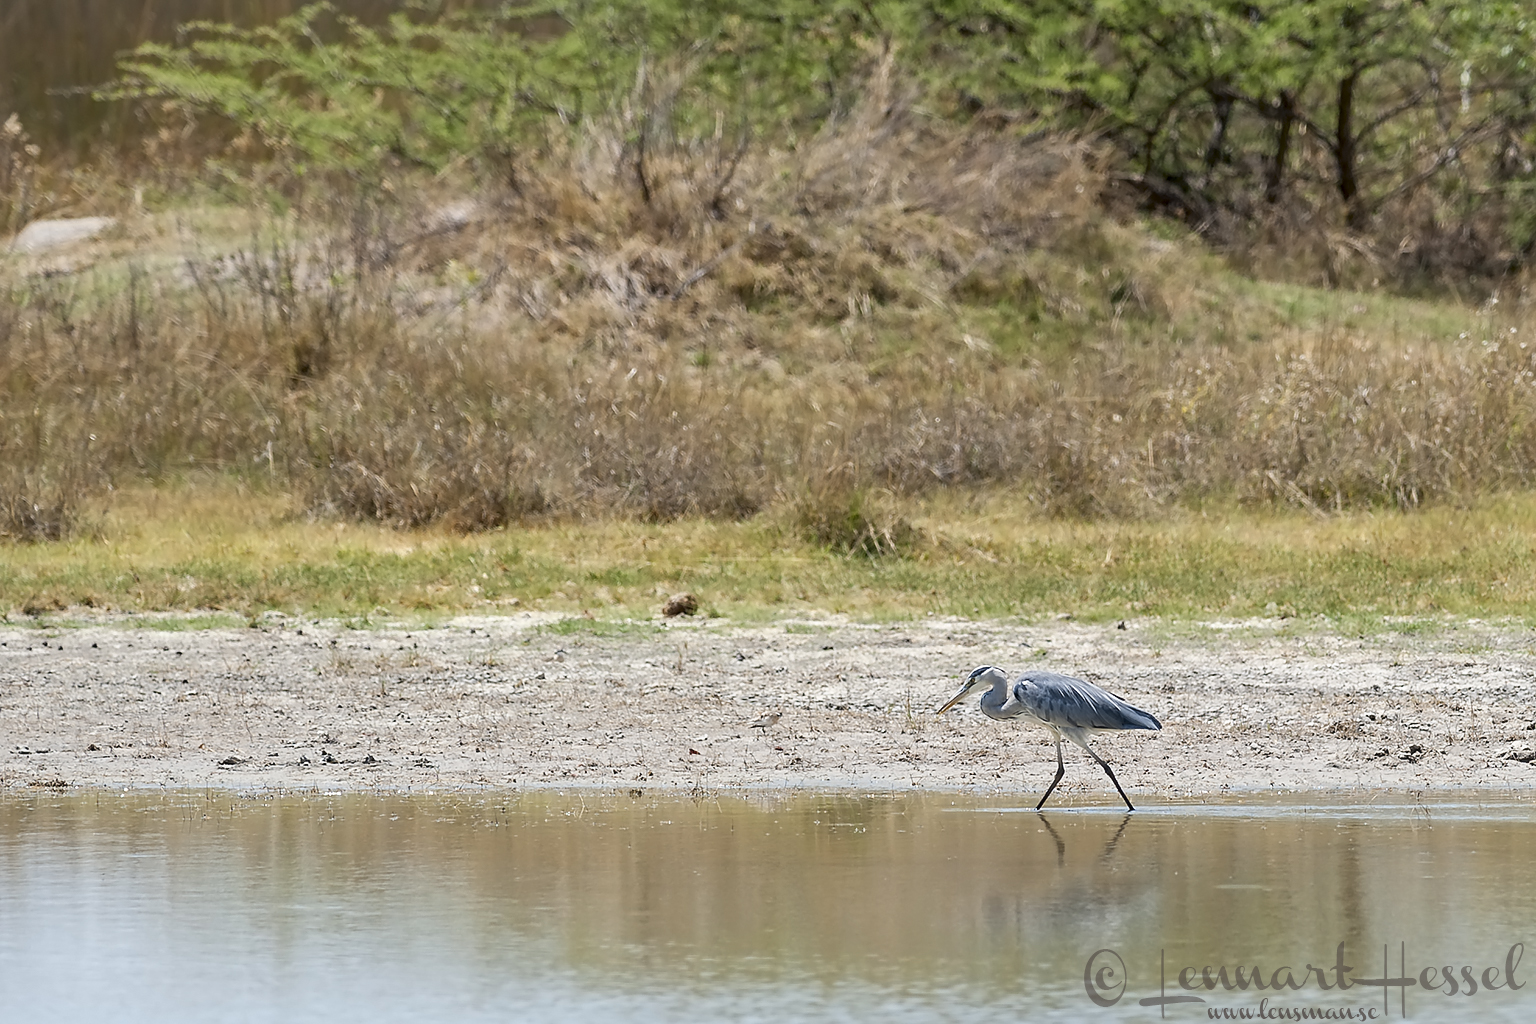 Grey Heron in Moremi Game Reserve, Botswana